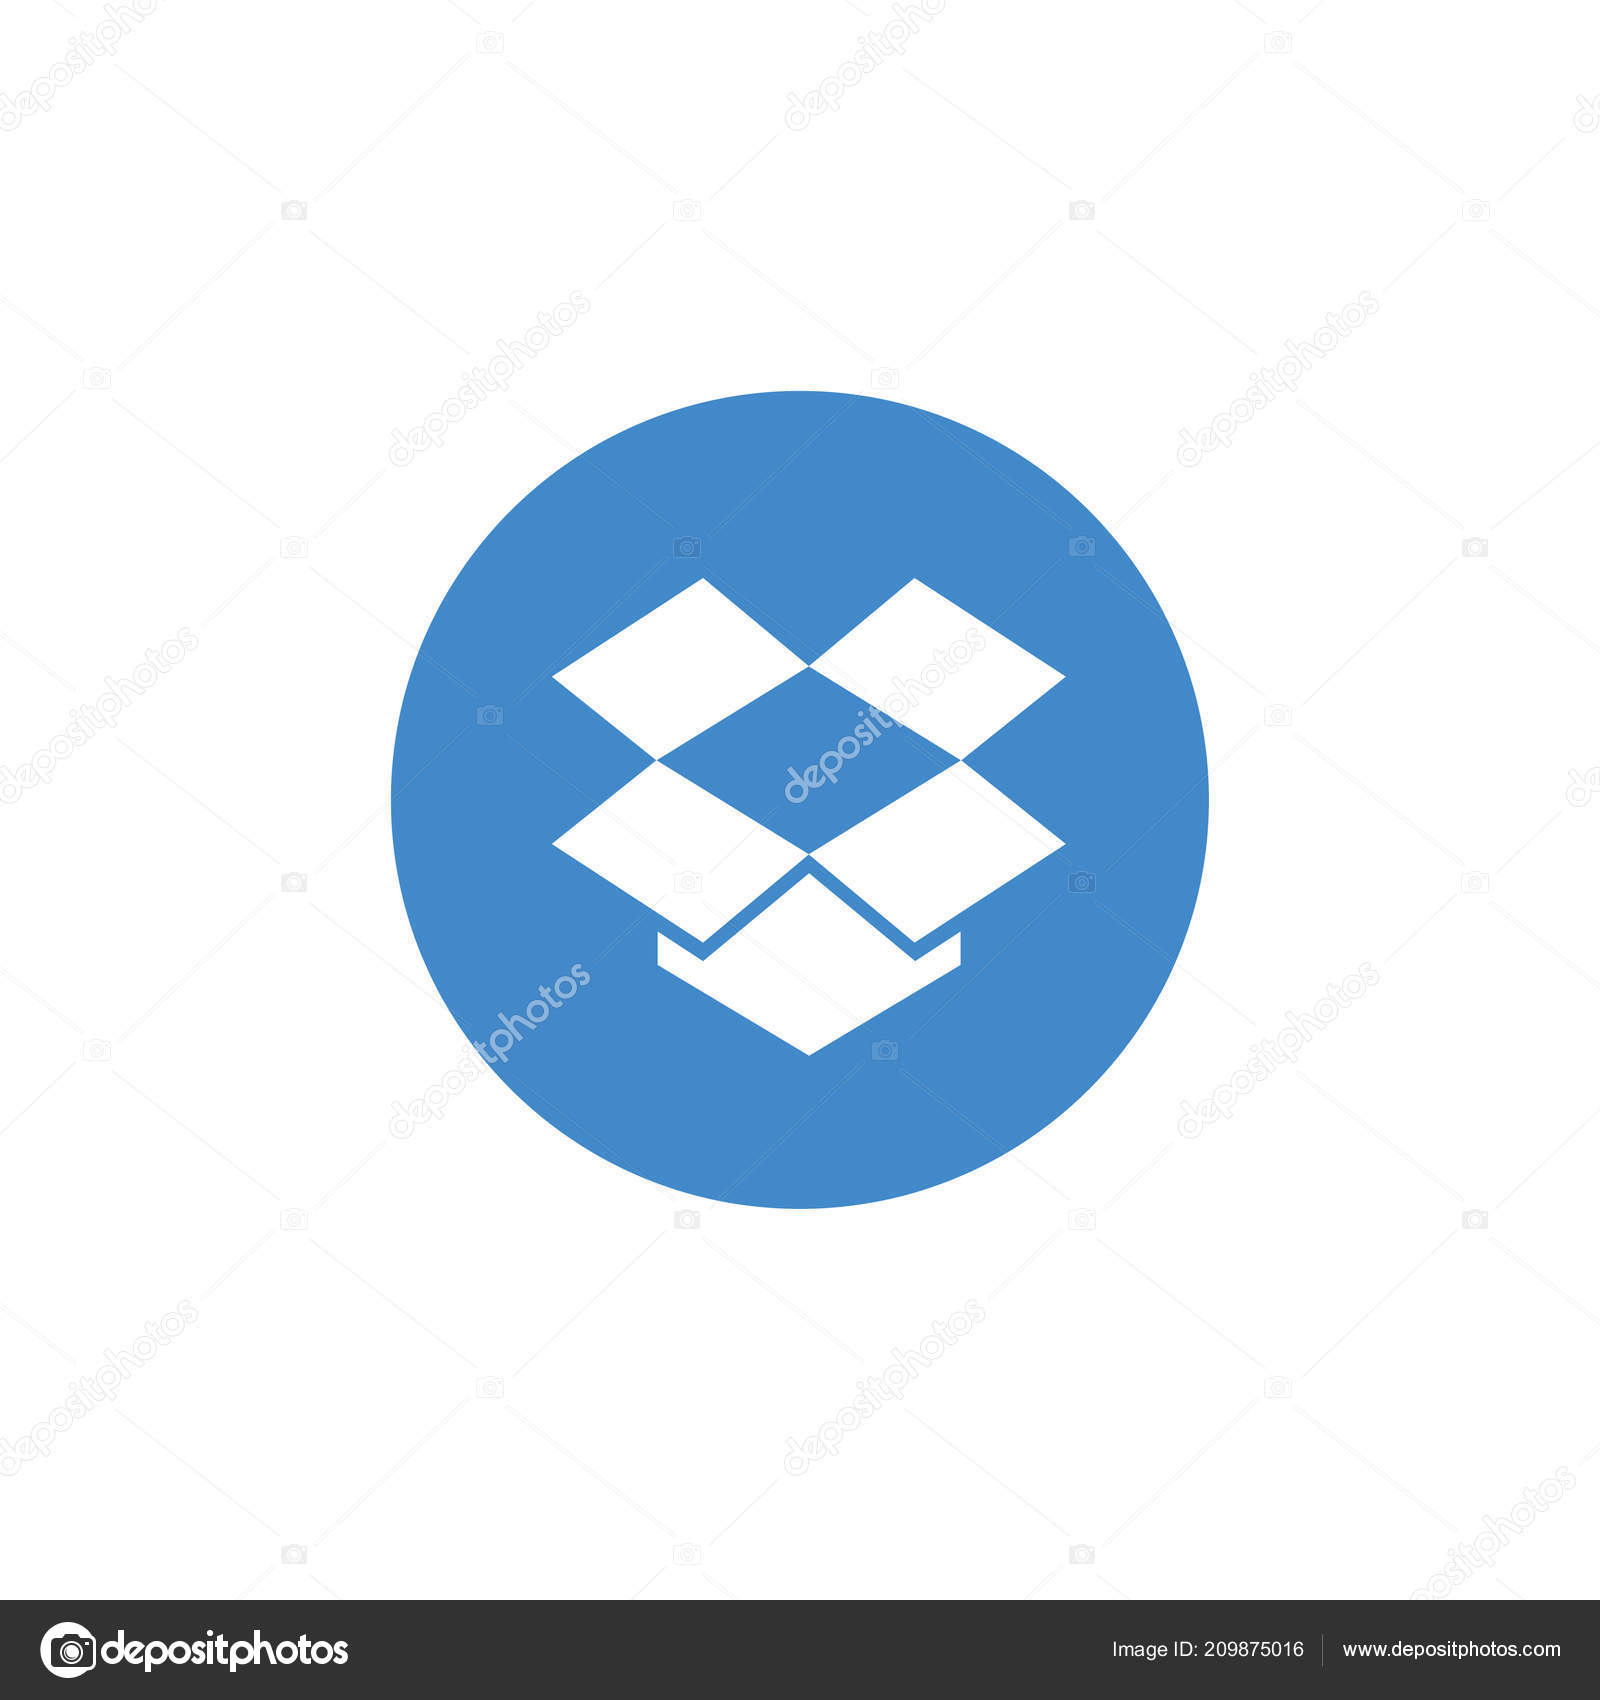 Dropbox Rteuman 209875016